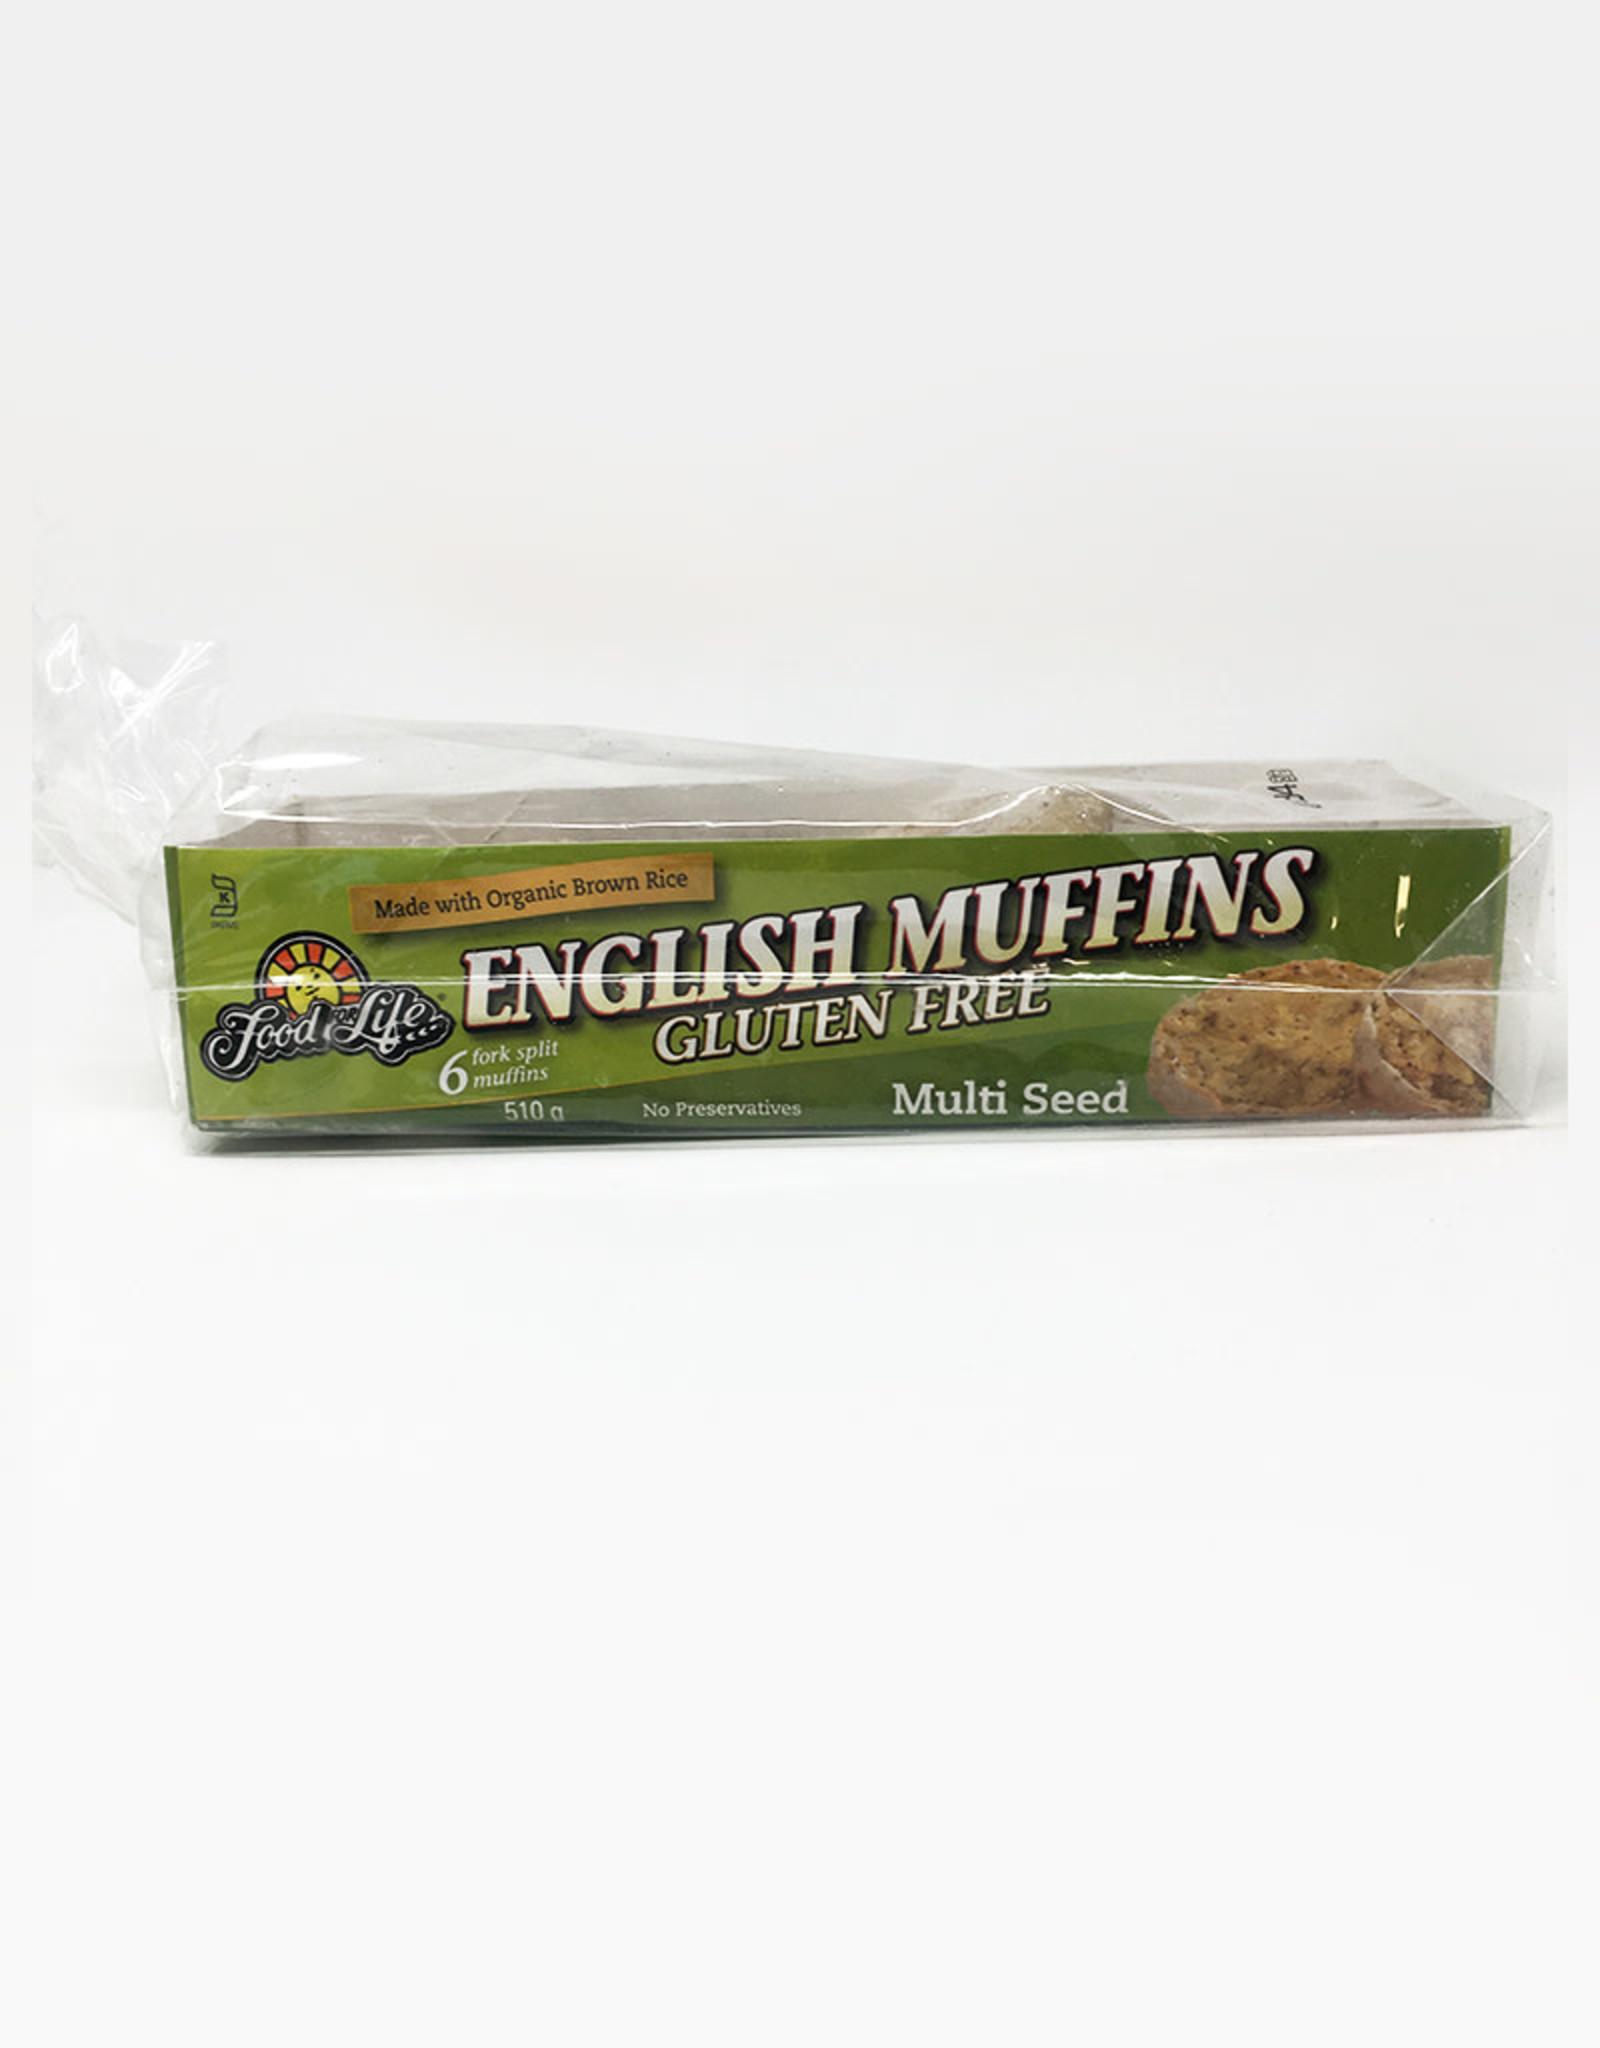 Food for Life FFL - English Muffins, GF Multi-Seed (510g)